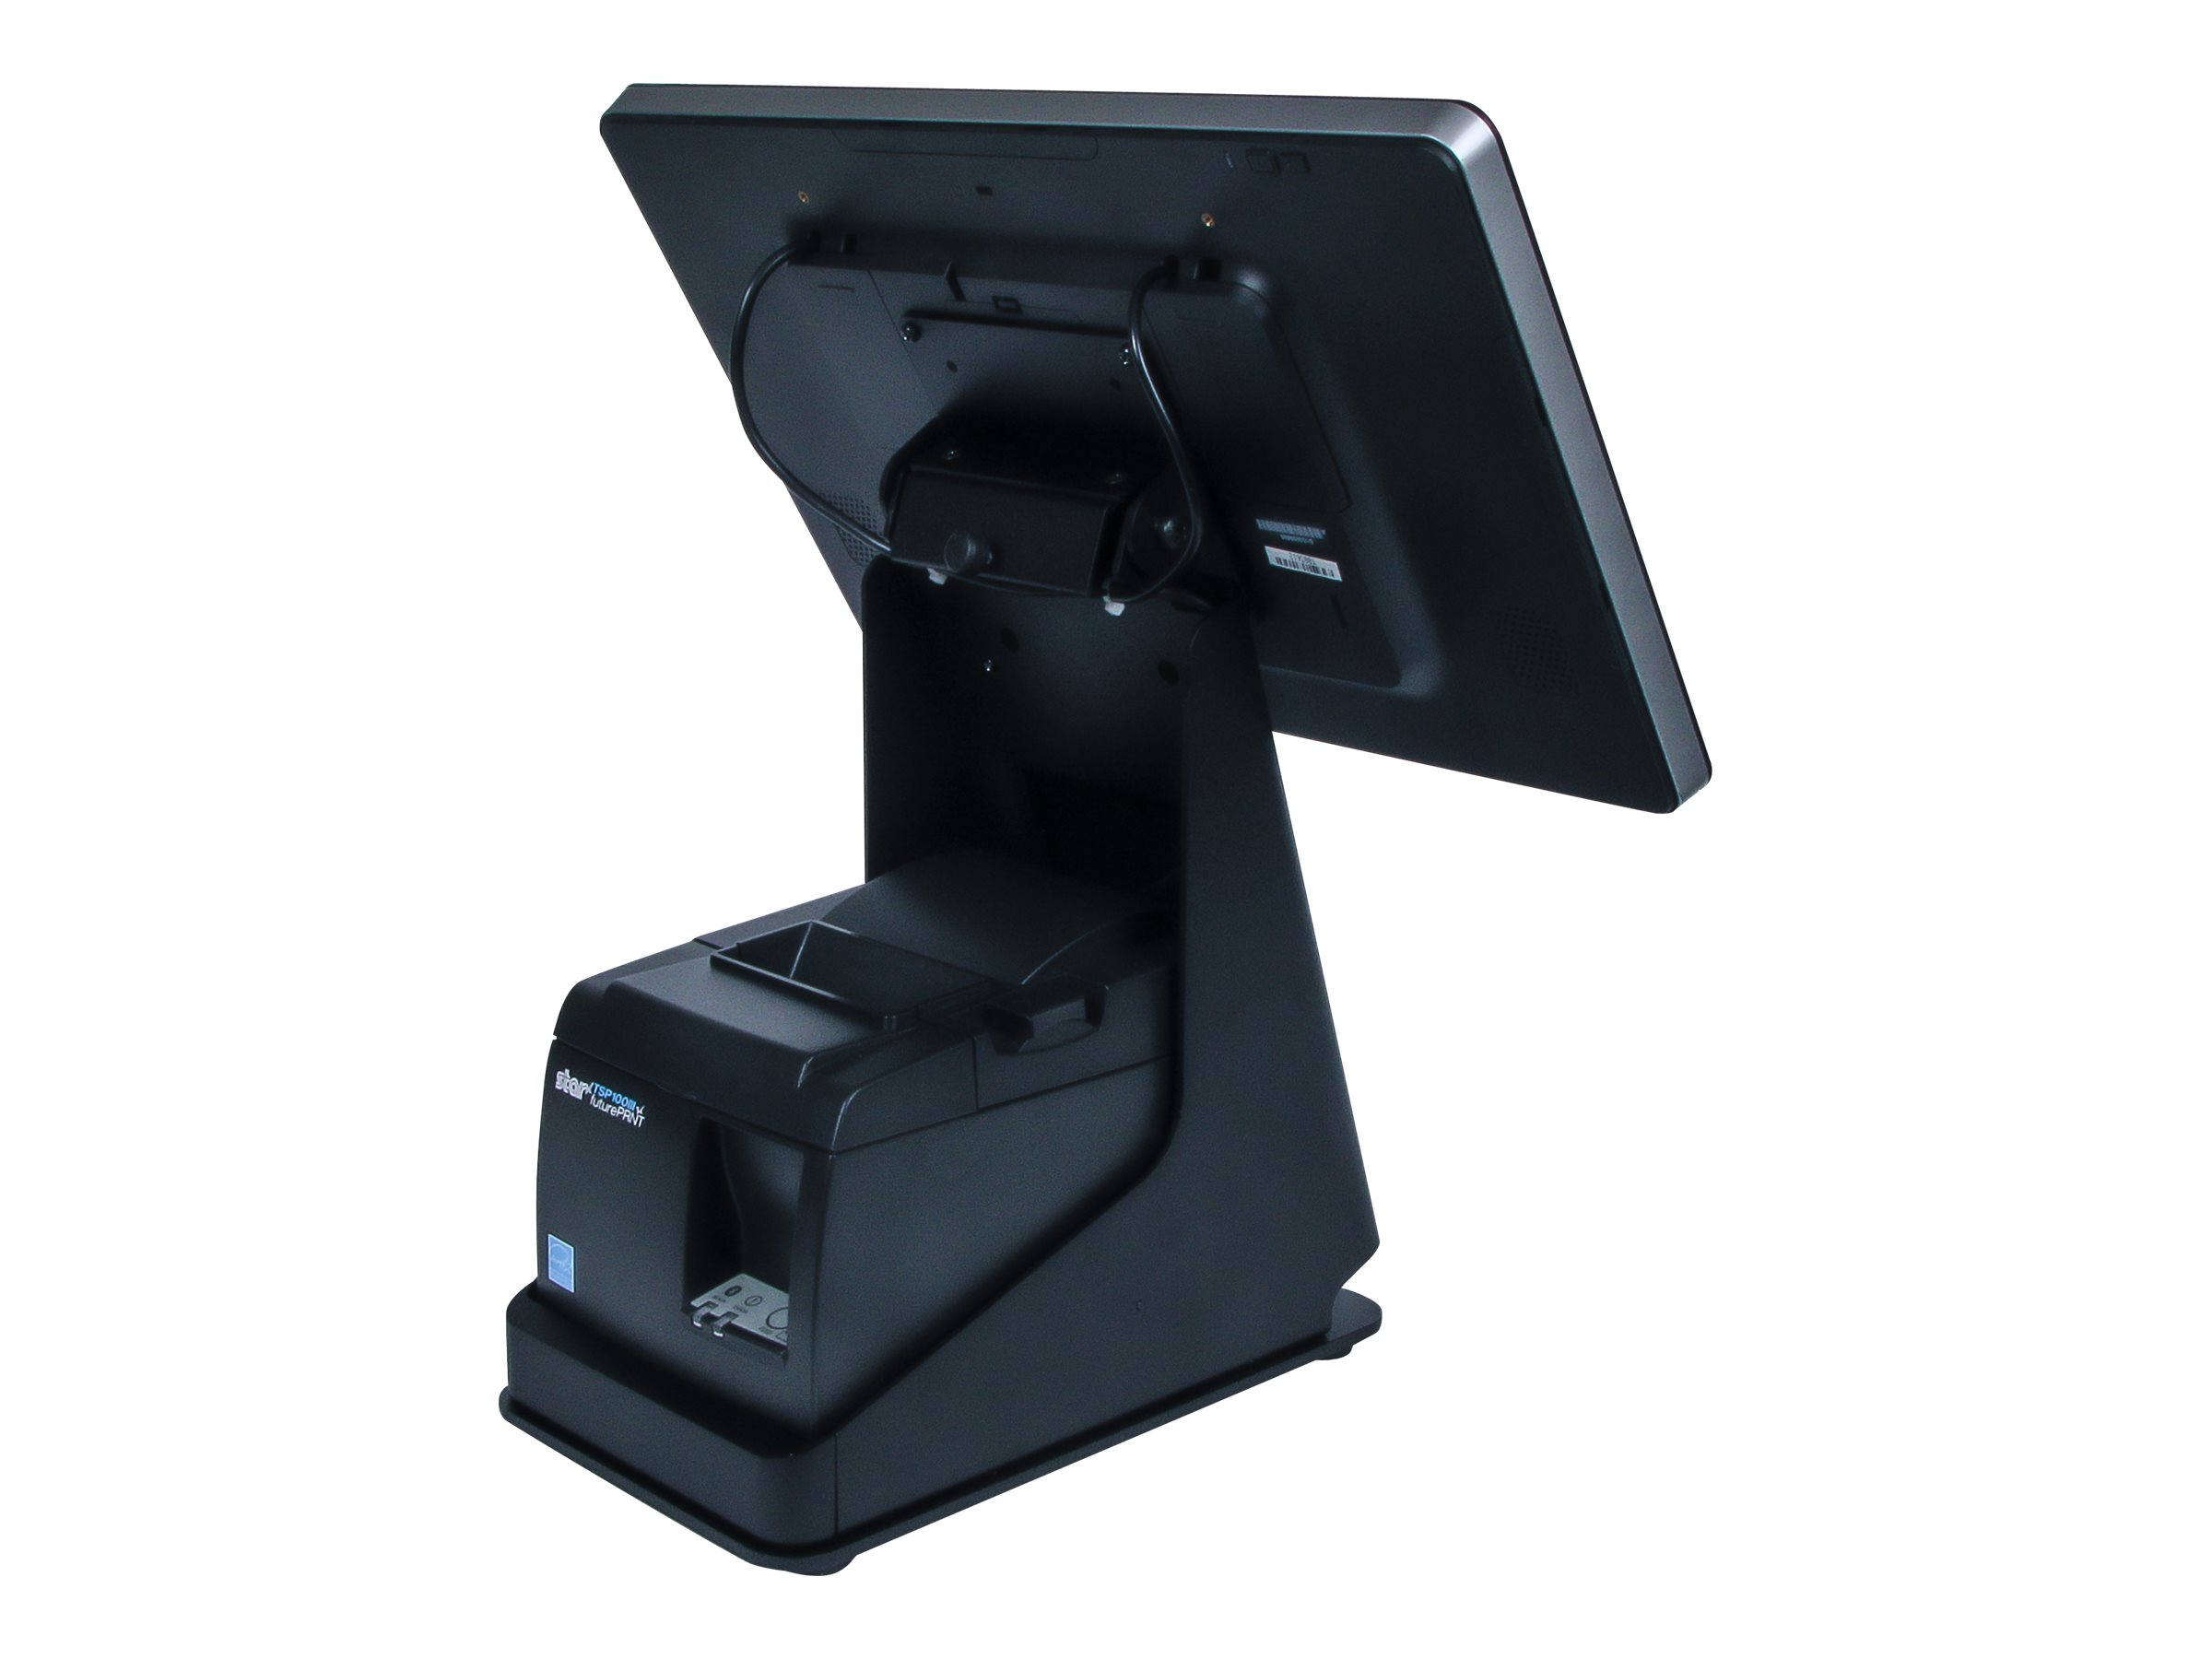 Elo mPOS Printer Stand - printer/monitor stand - 10